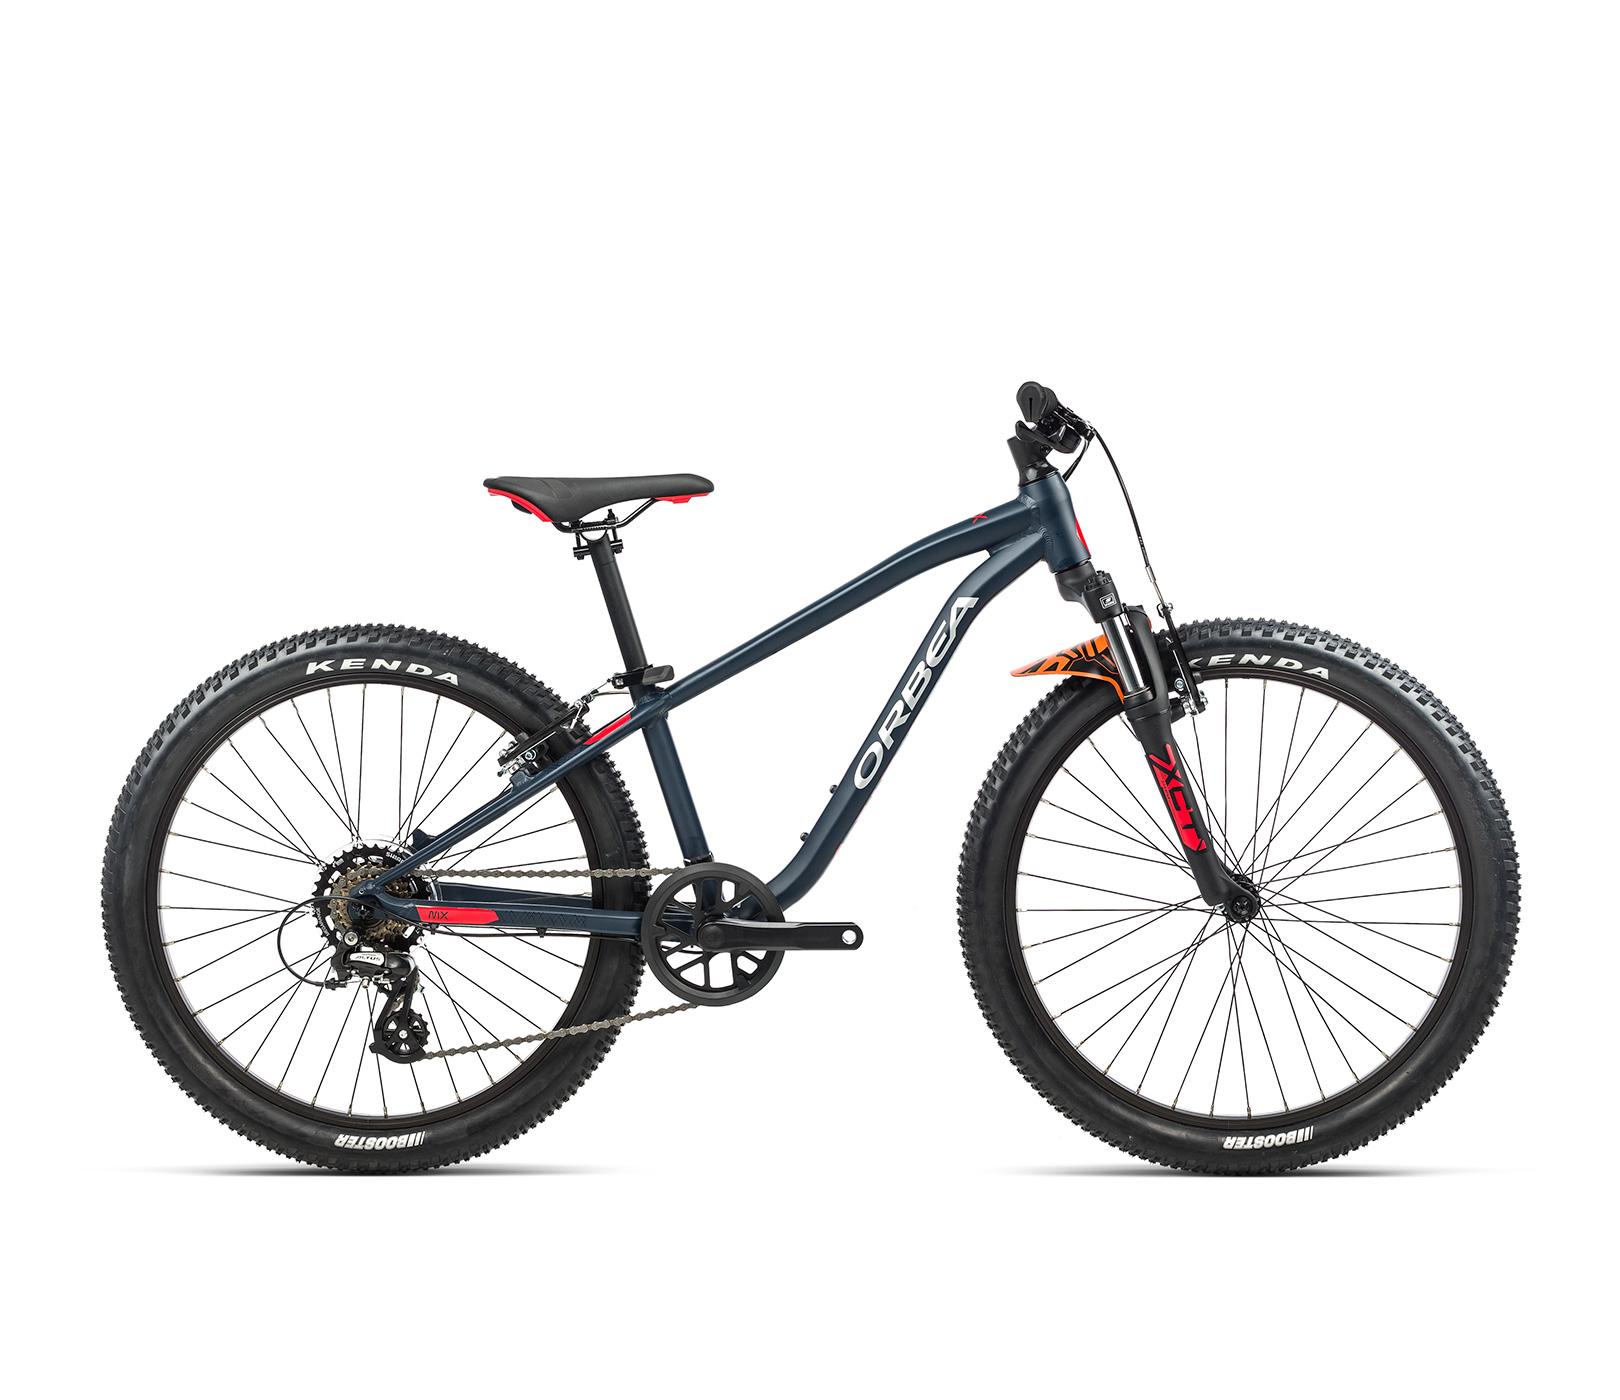 Orbea MX24 XC 24 Inch Kids Mountain Bike 2021 Bondi Blue/Bright red